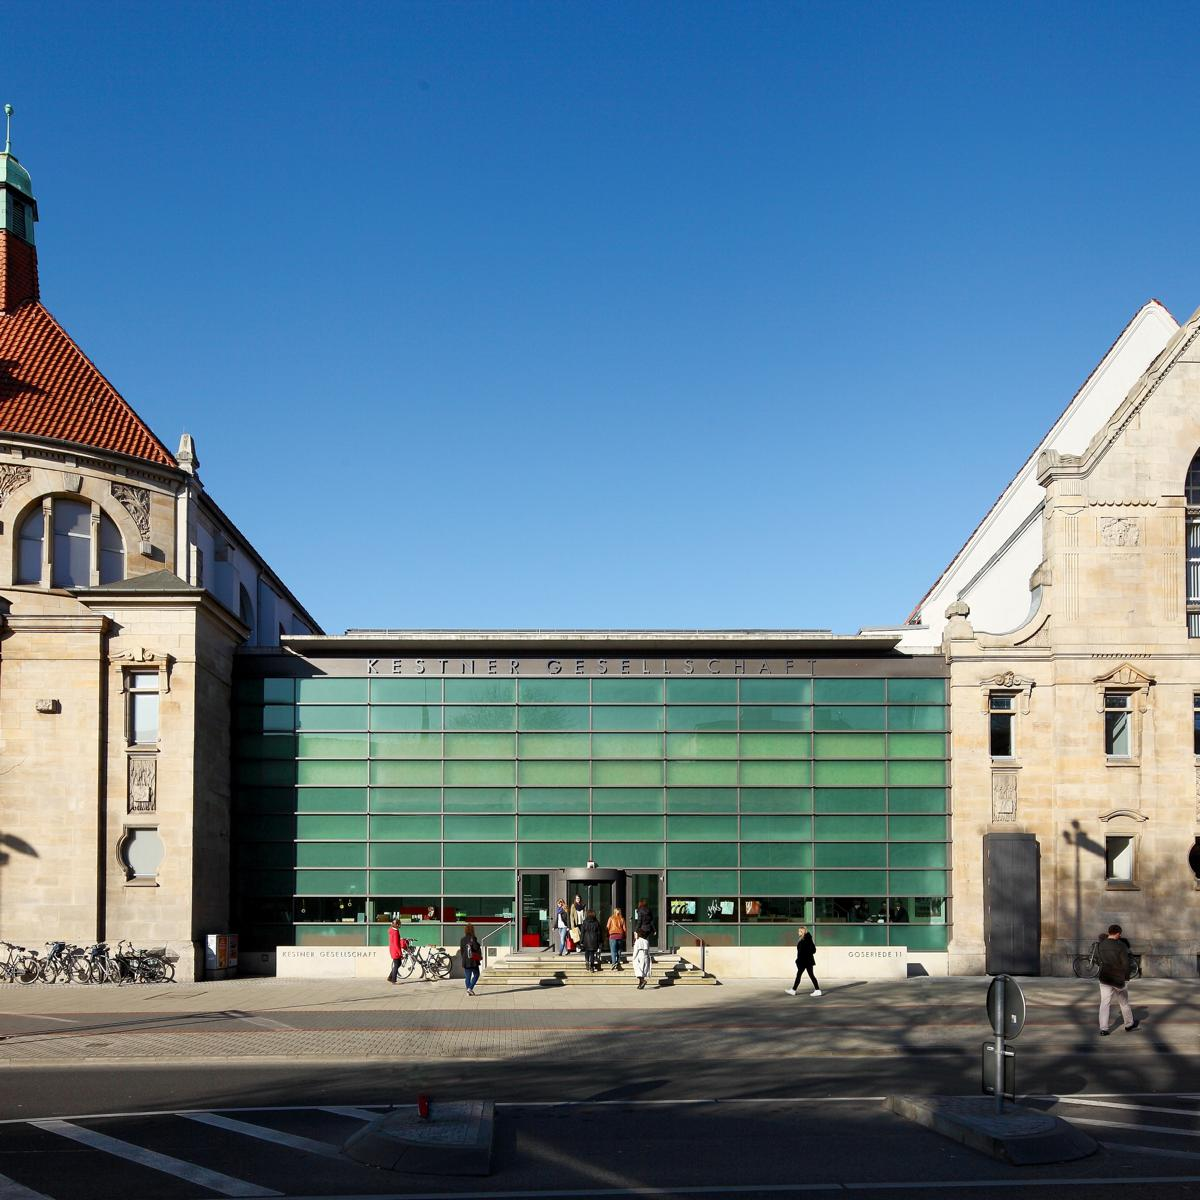 Style Hannover Kestnergesellschaft B - Die spannendsten Museen in Hannover